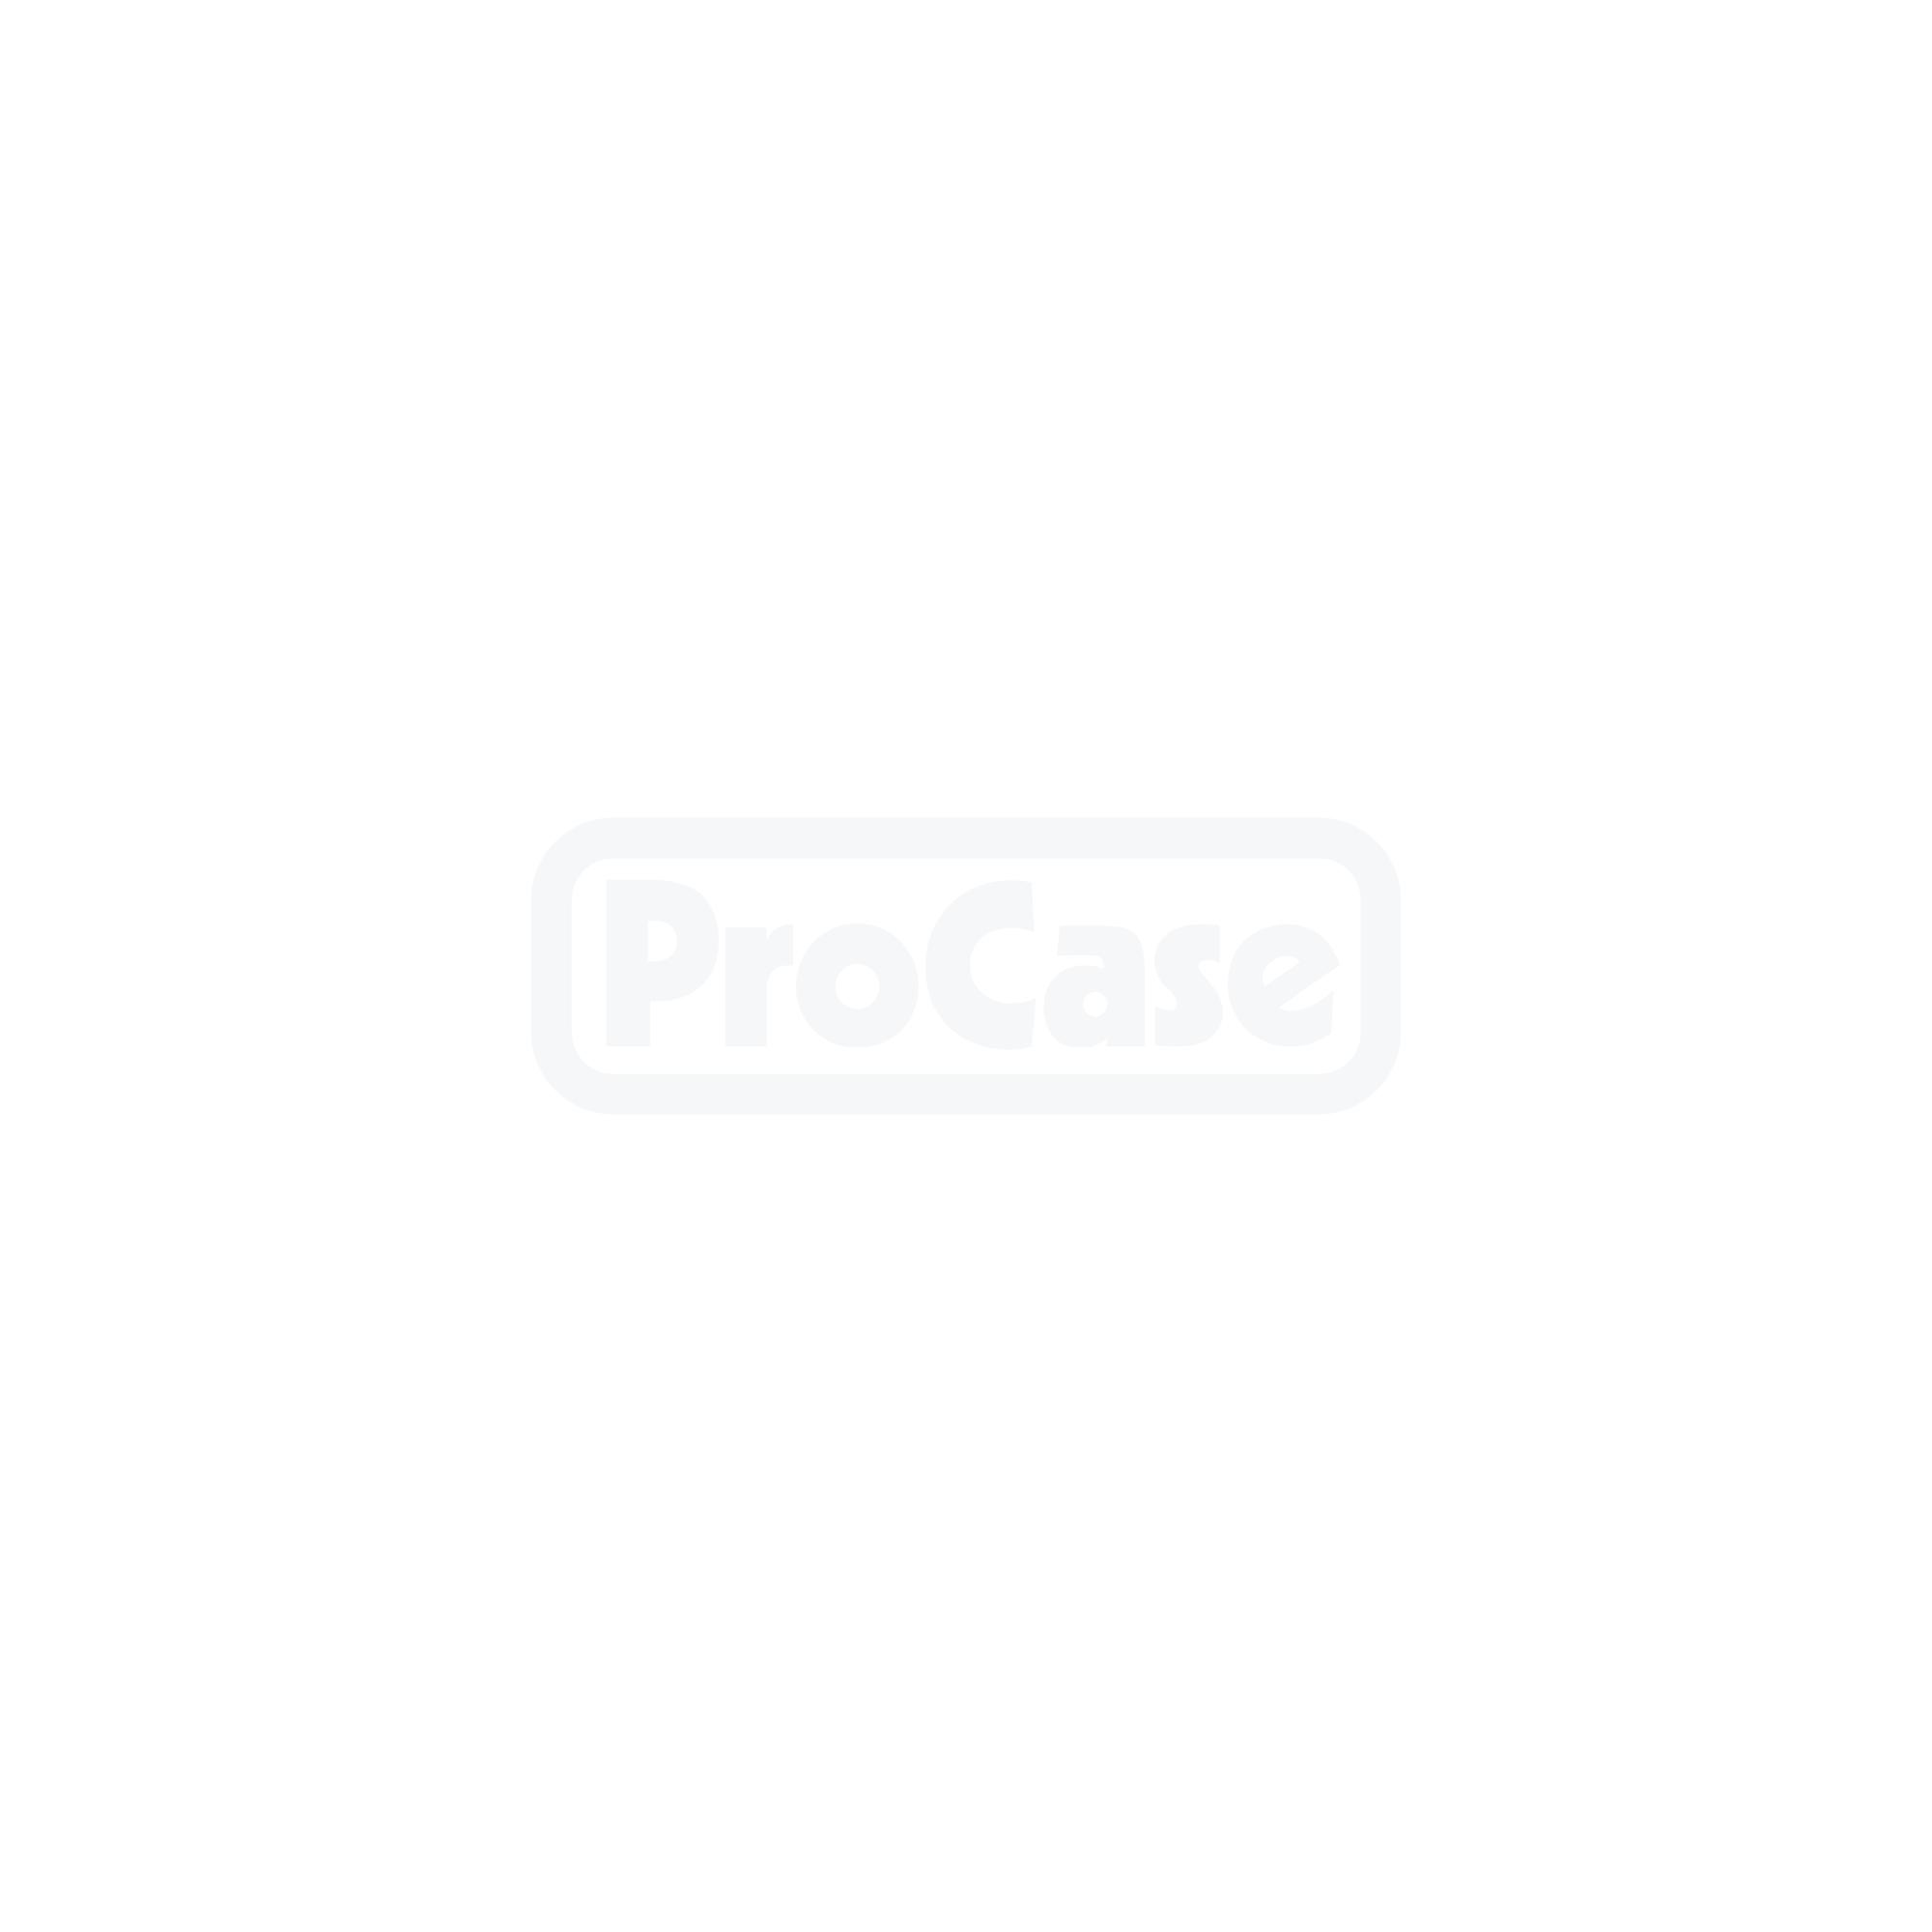 Flipcase für Yamaha Rivage PM7/PM10 CS-R10